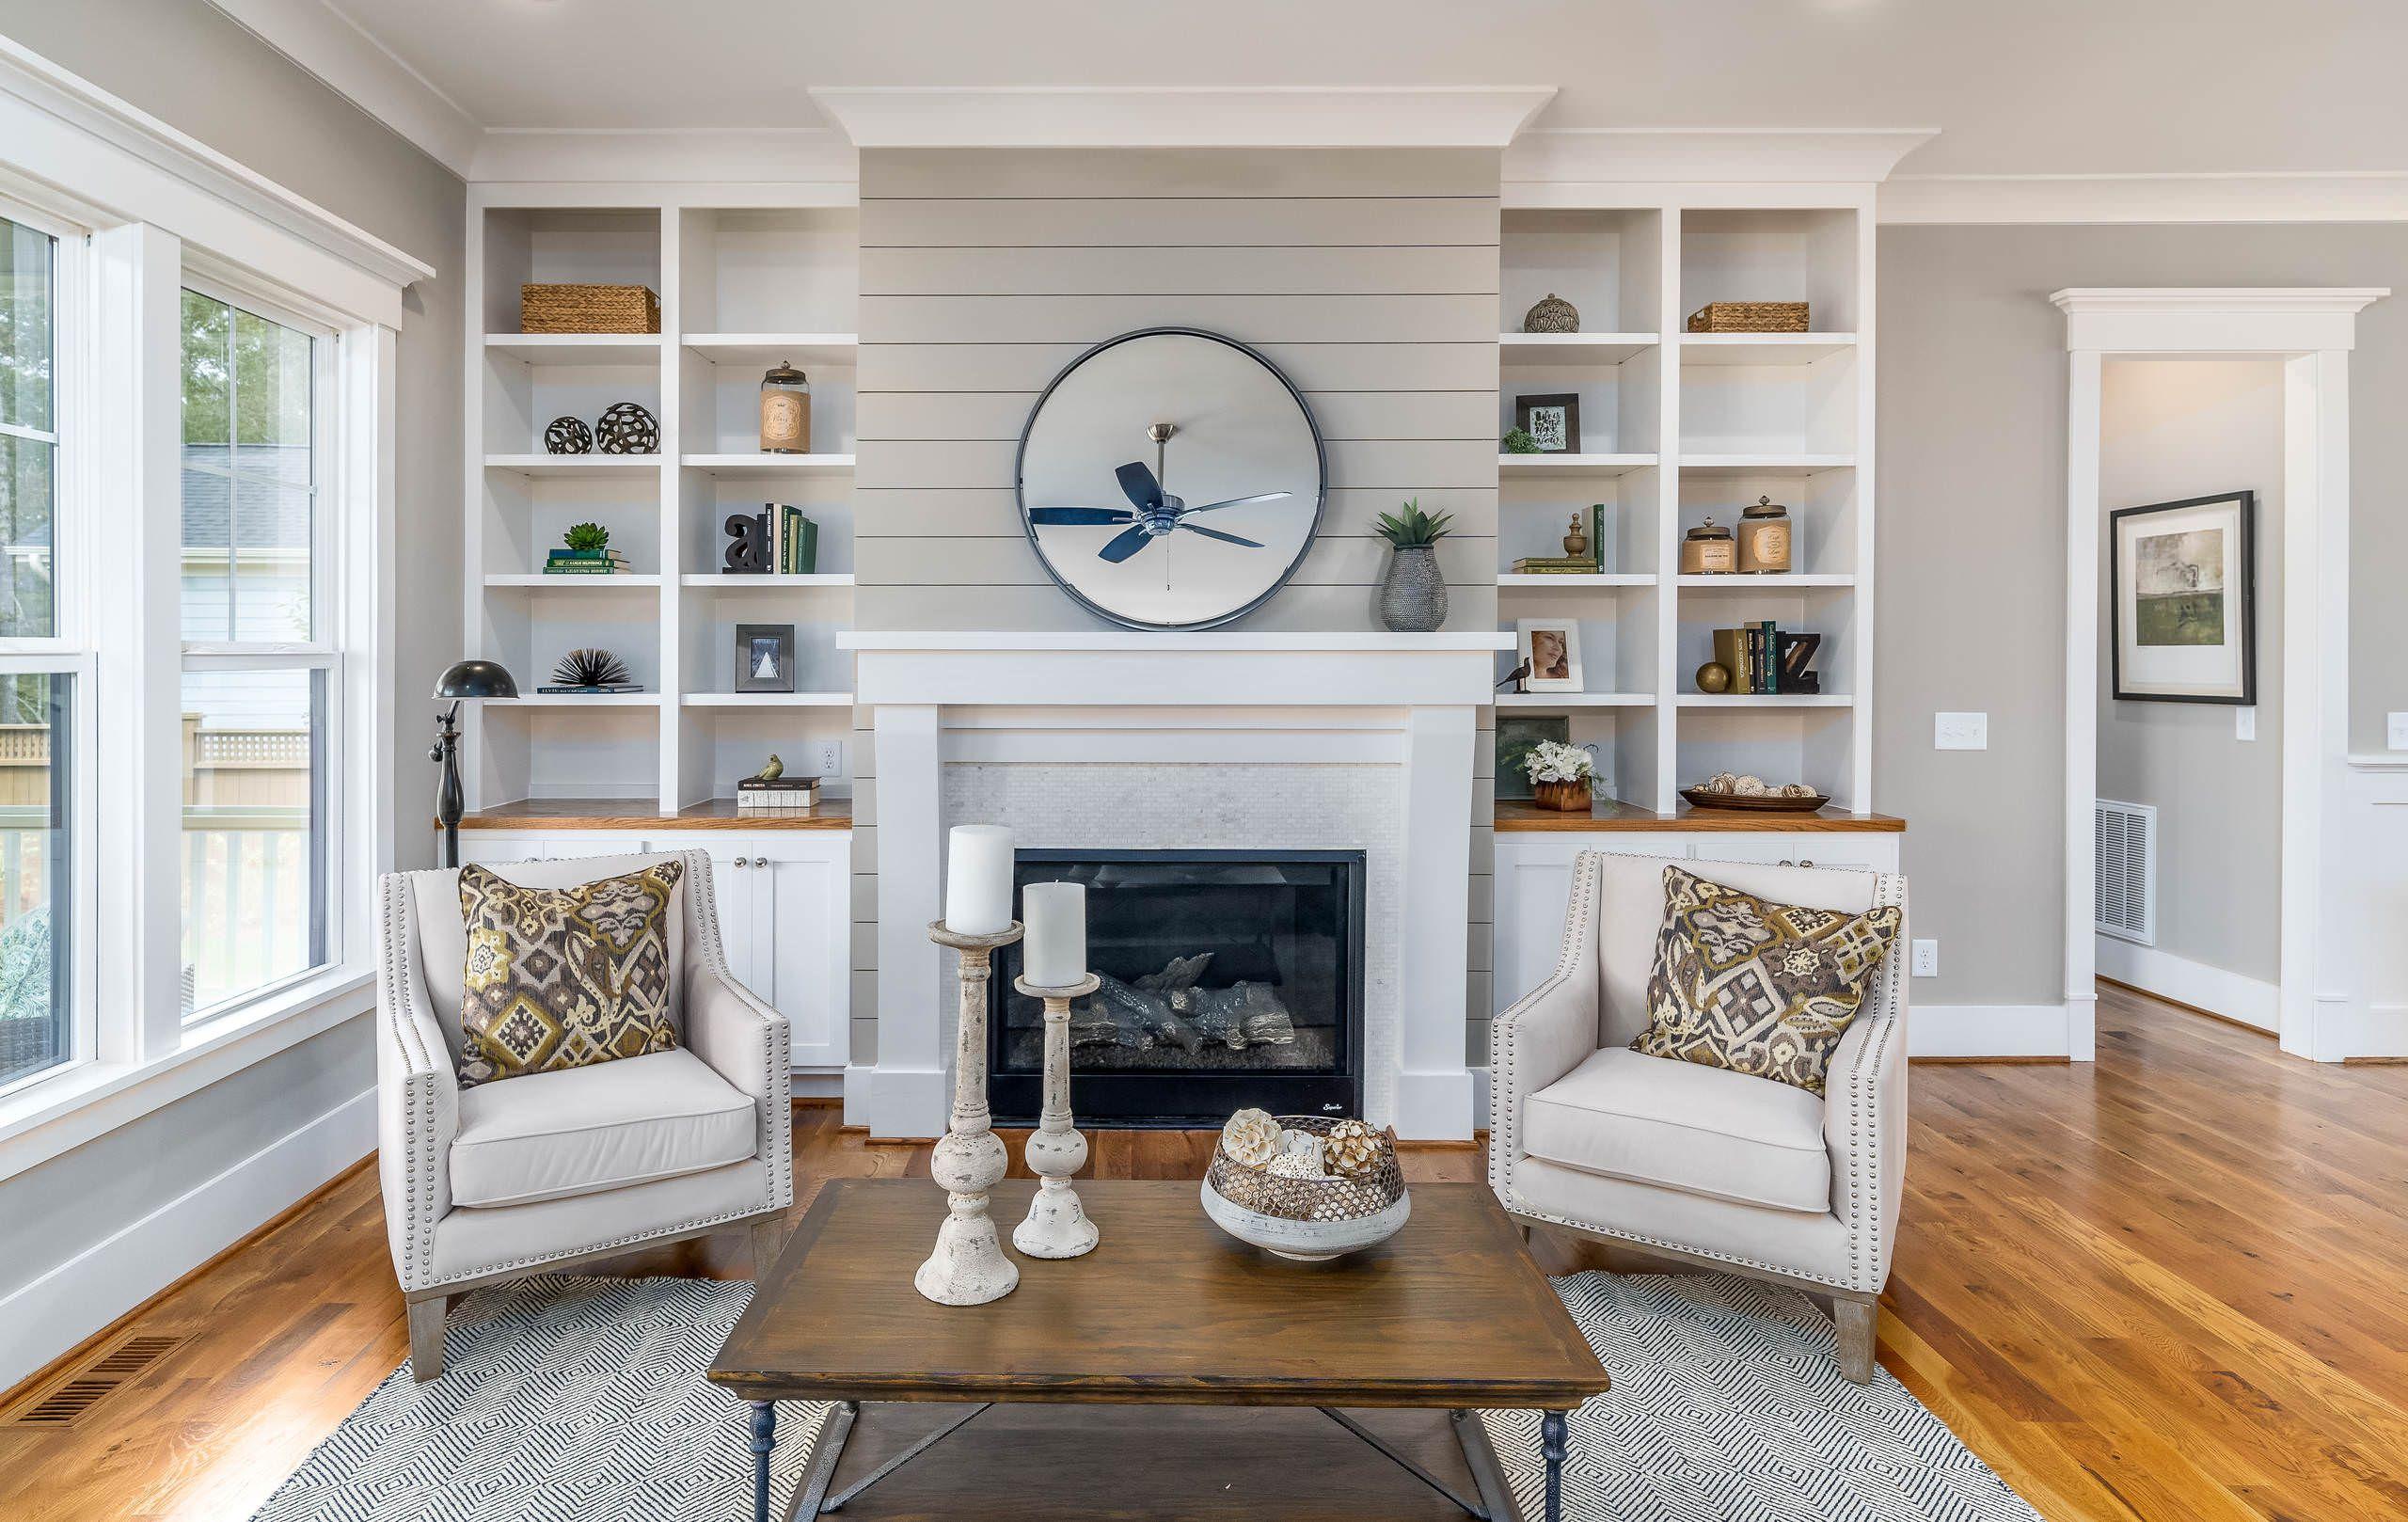 How To Get The Farmhouse Style Living Room | Farmhouse ...